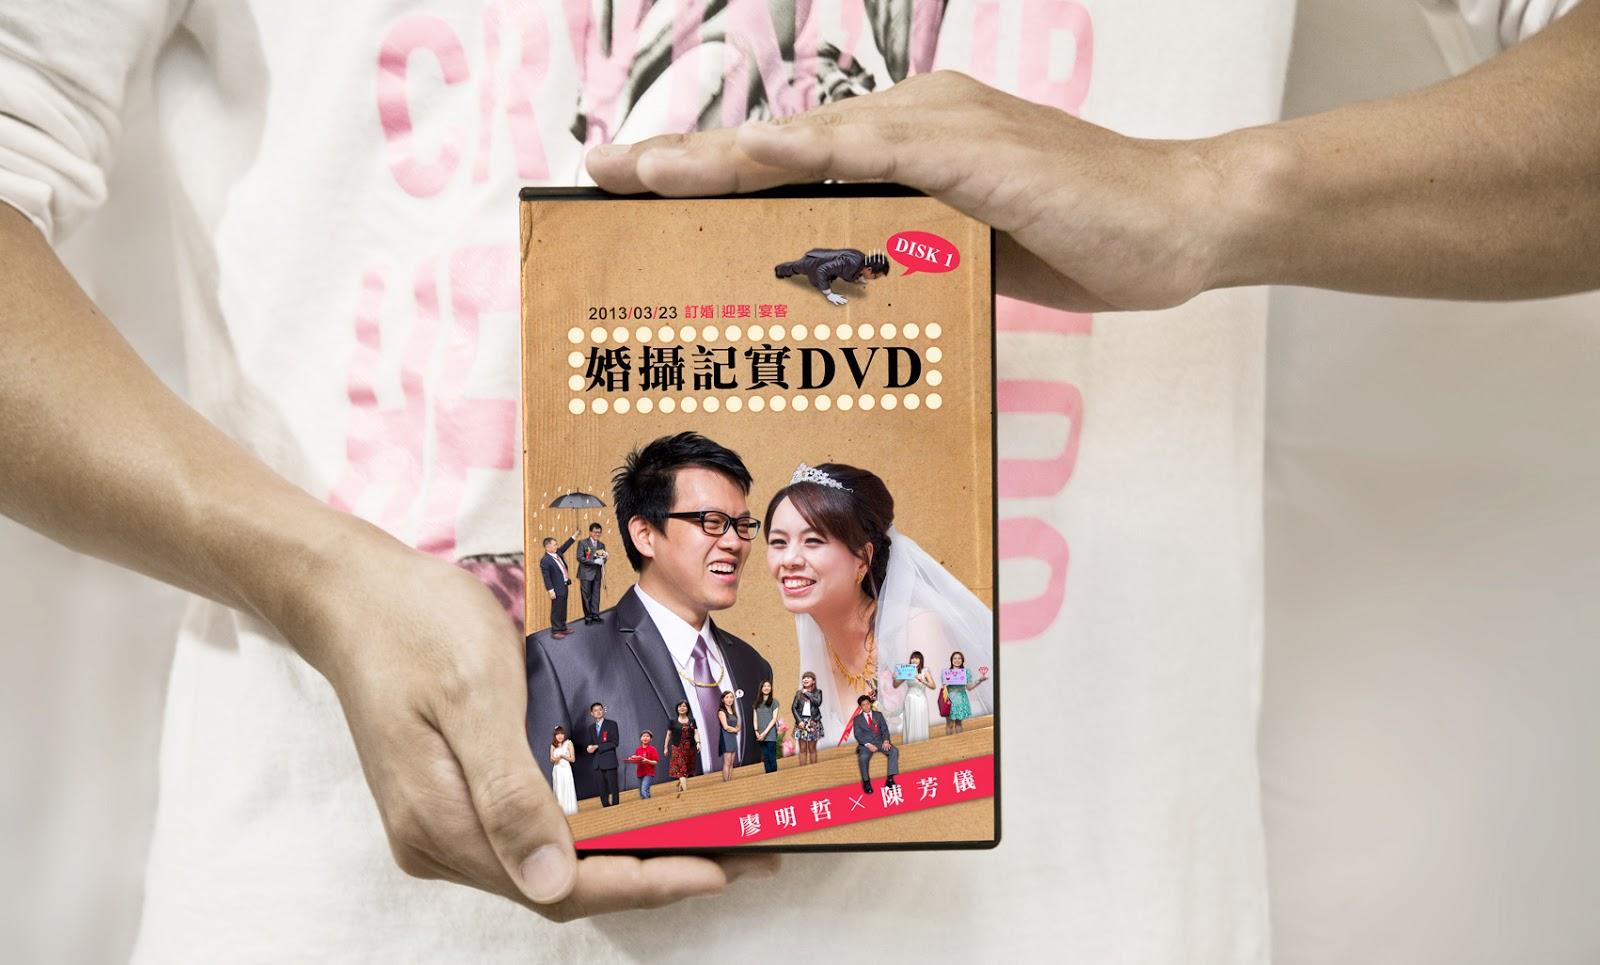 SHOWCASE作品展示 | 明哲×芳儀婚攝DVD封面設計 by MUMULab.com